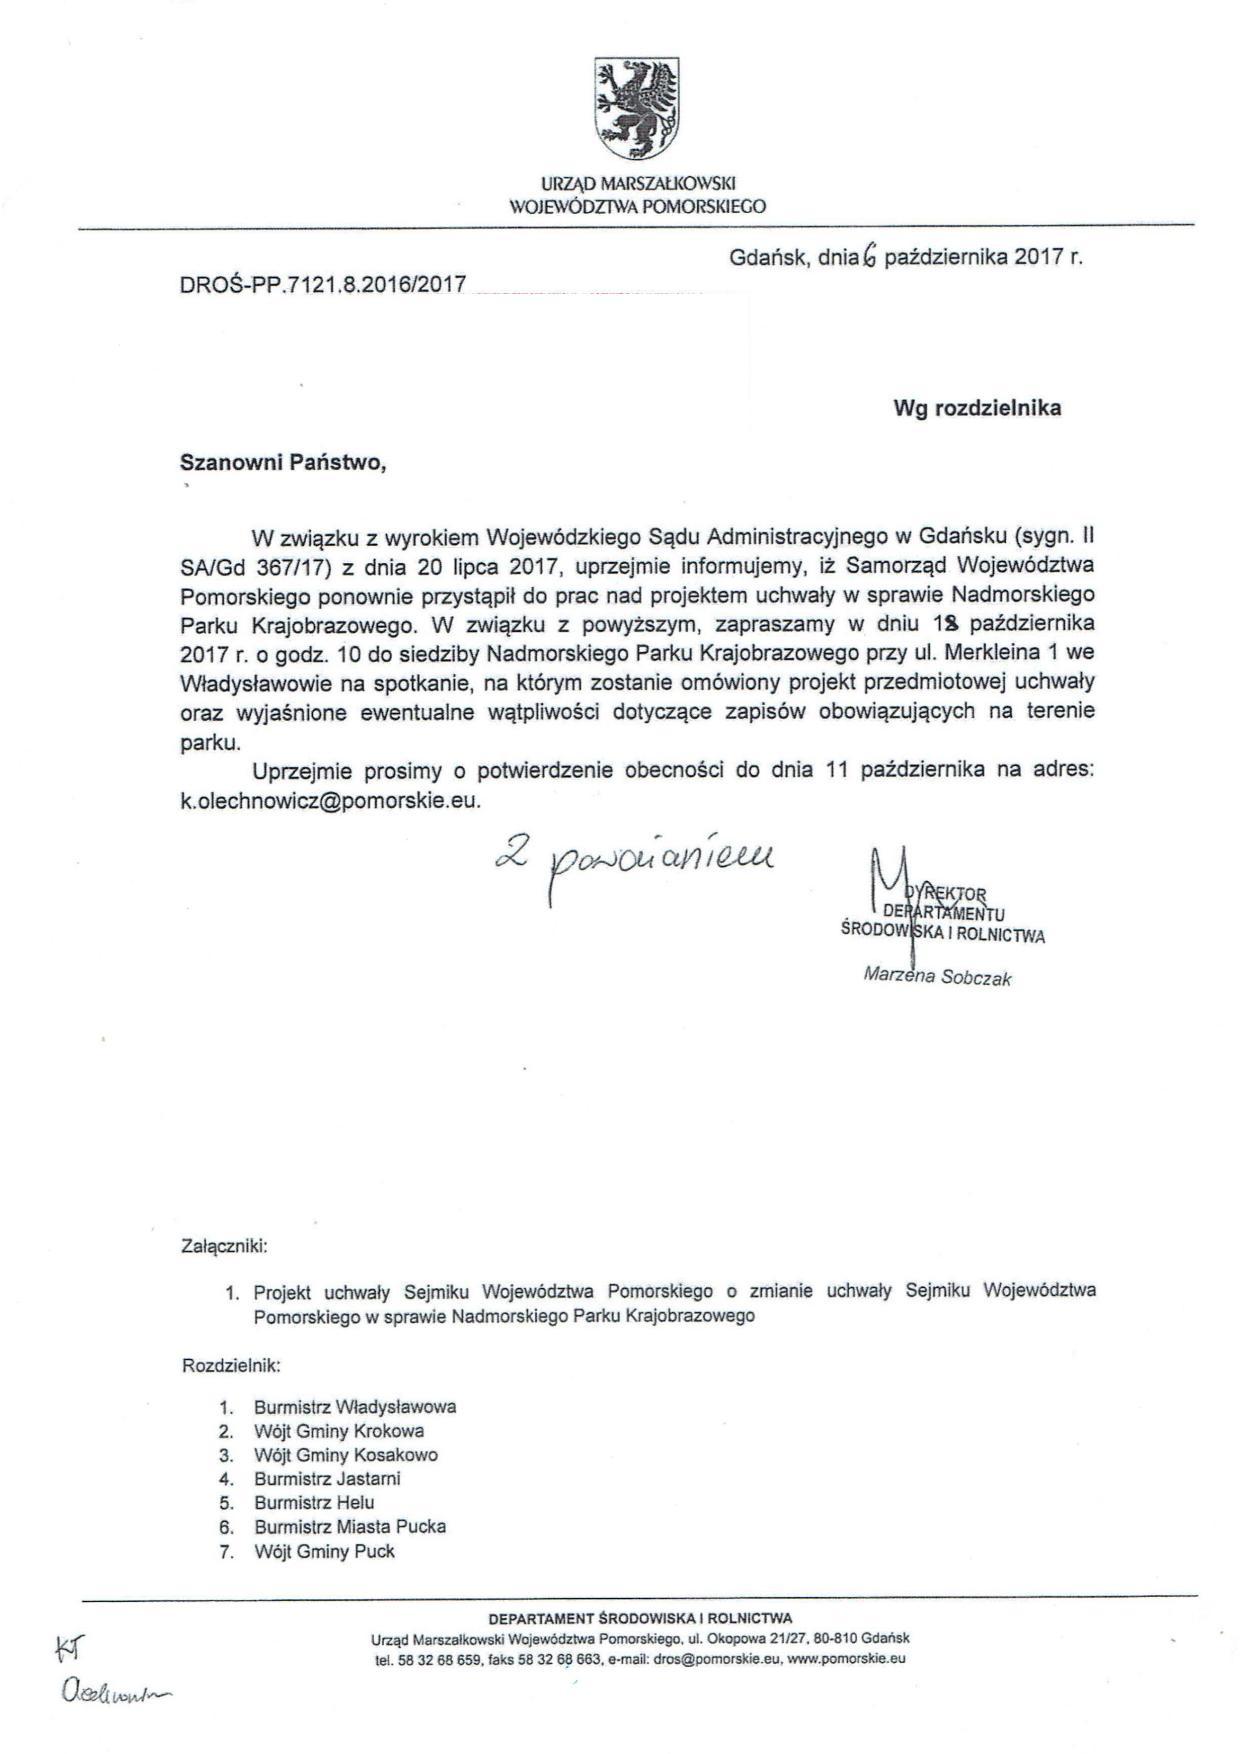 scan_Pismo Nr _DROŚ-PP.7121.8.2016-2017_06.10.2017_01